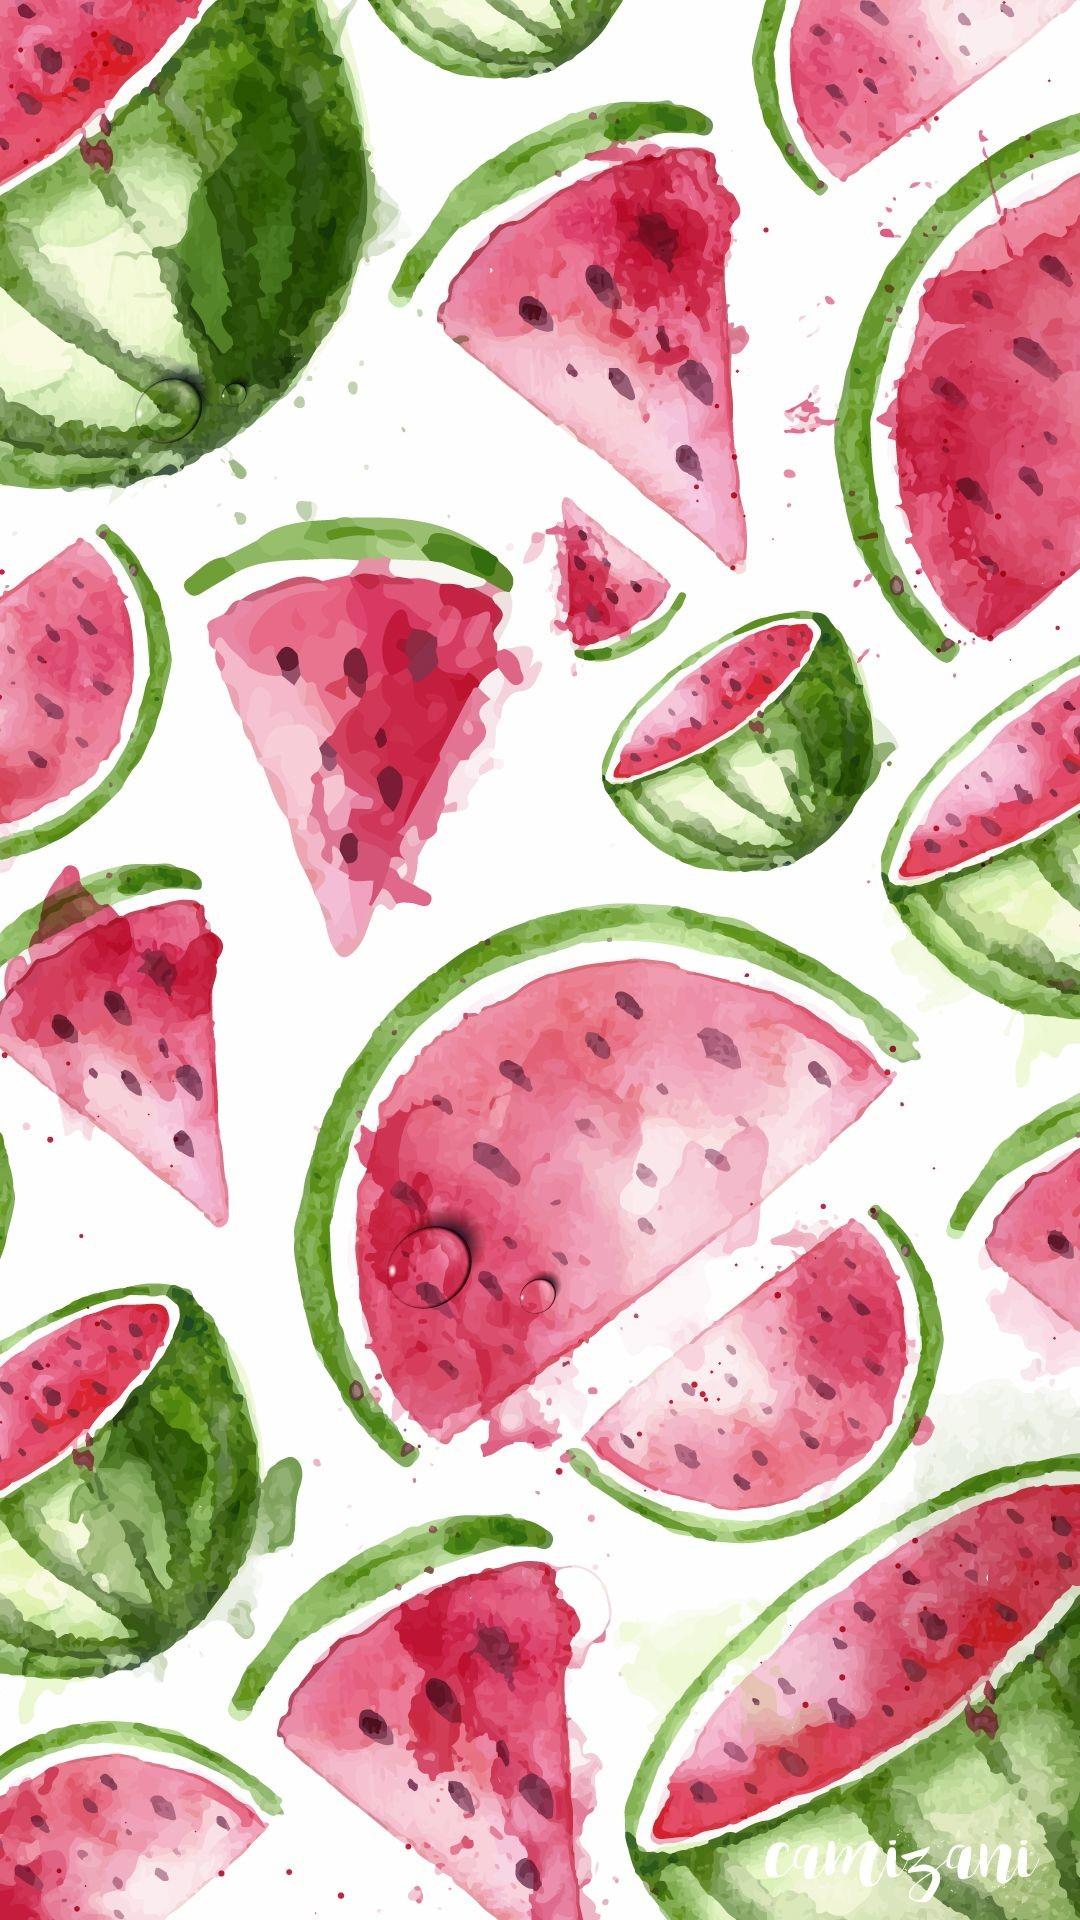 1263049 full size cute fruit wallpaper 1080x1920 for mac